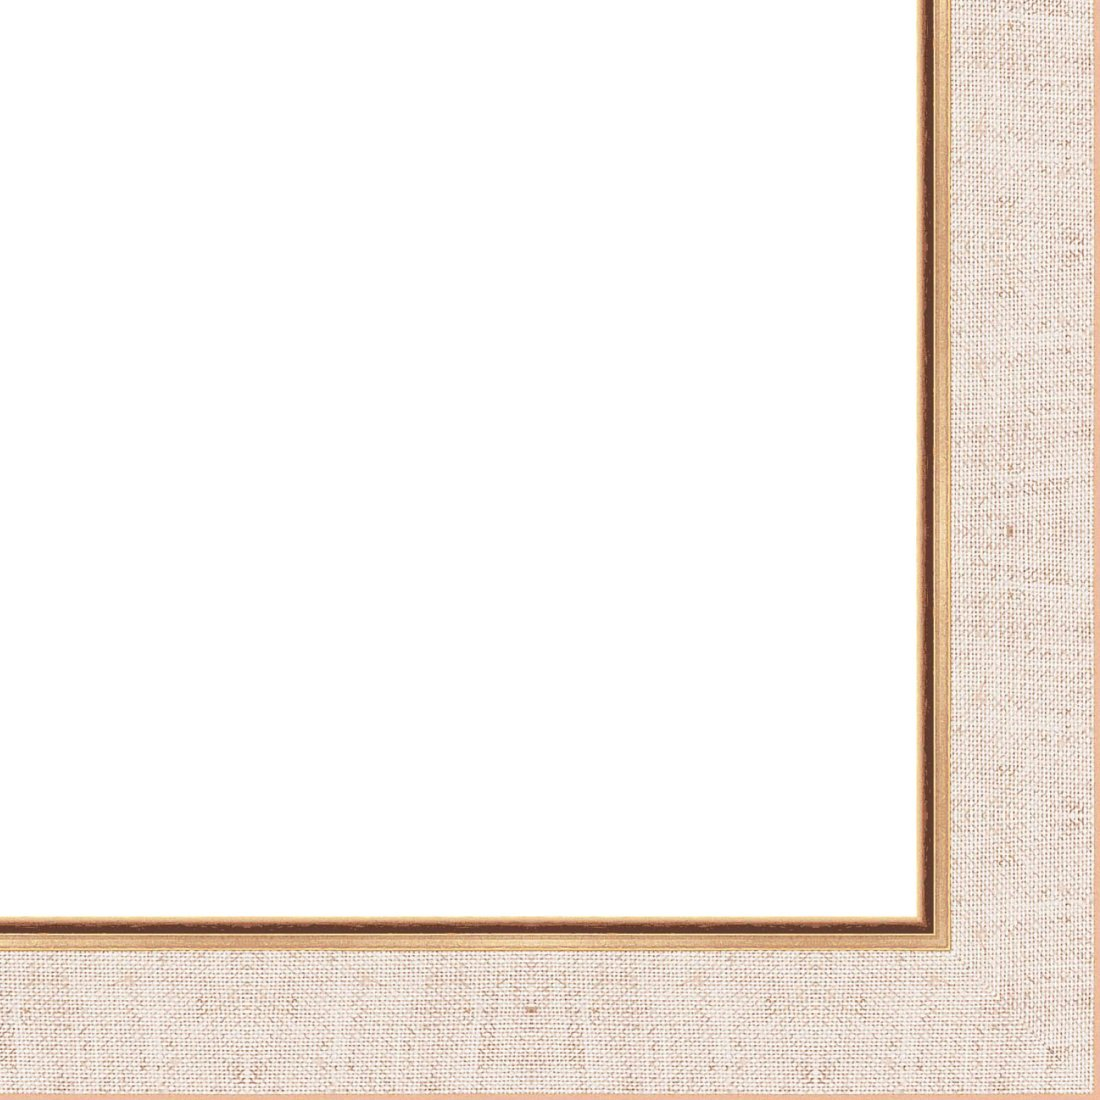 Picture Linen Liner (Wood) 18ft bundle - Wheat/Oatmeal - 1.25'' width - 5/16'' rabbet depth